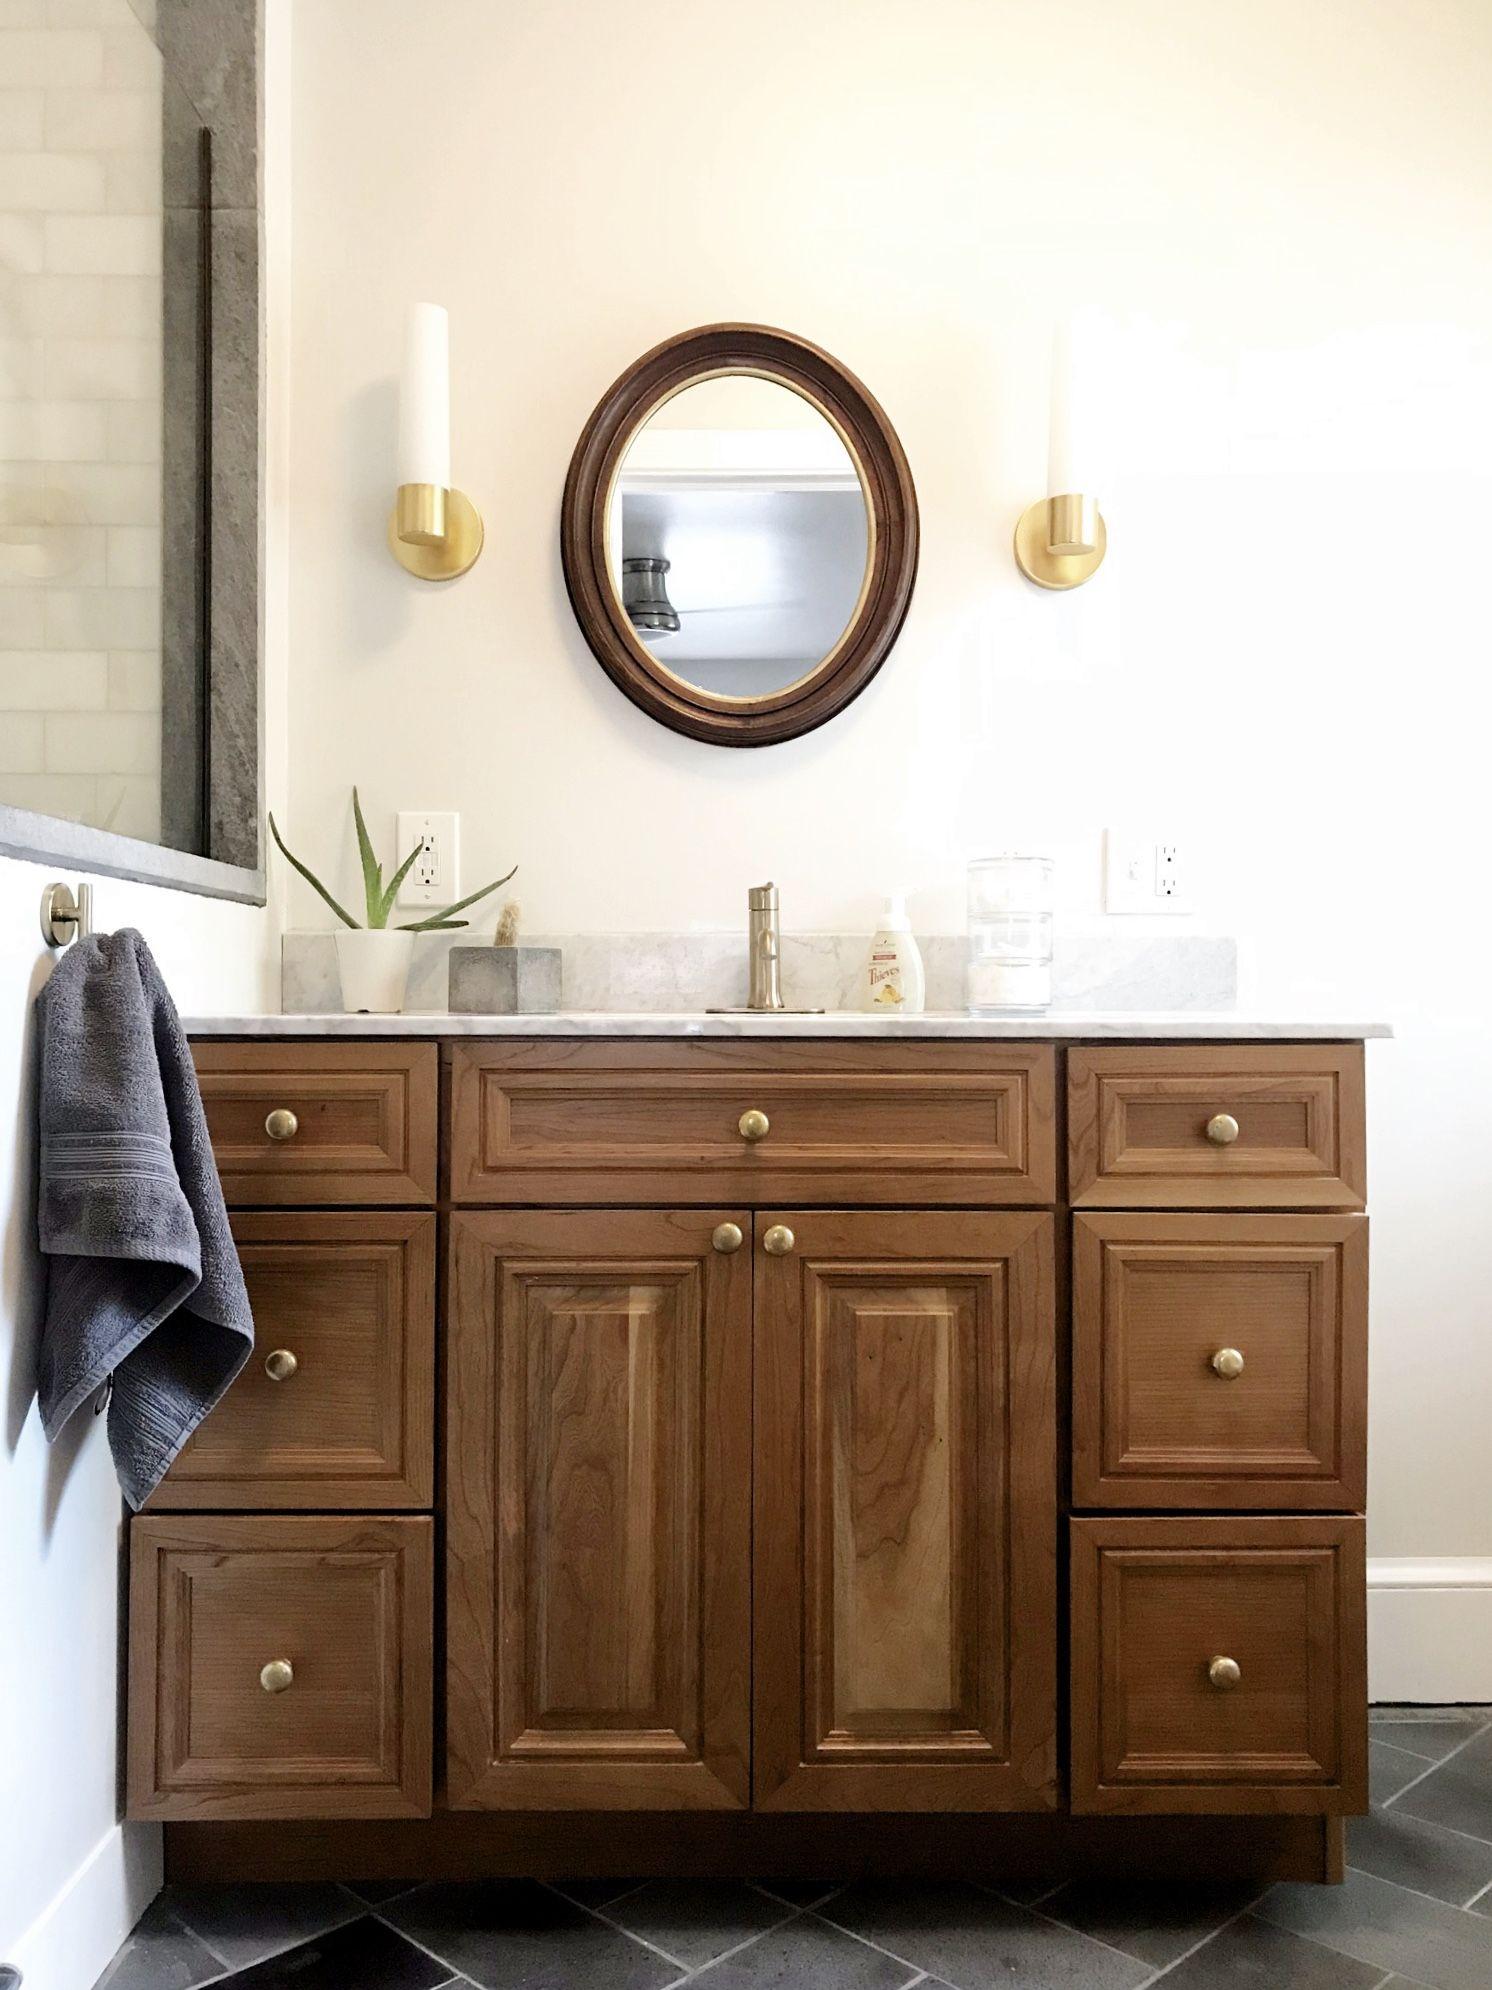 Vanity And Marble Countertop Sourced From Craigslist Marble Subway Tile On Showe Waterproof Bathroom Wall Panels Bathroom Wall Panels Wood Look Tile Bathroom